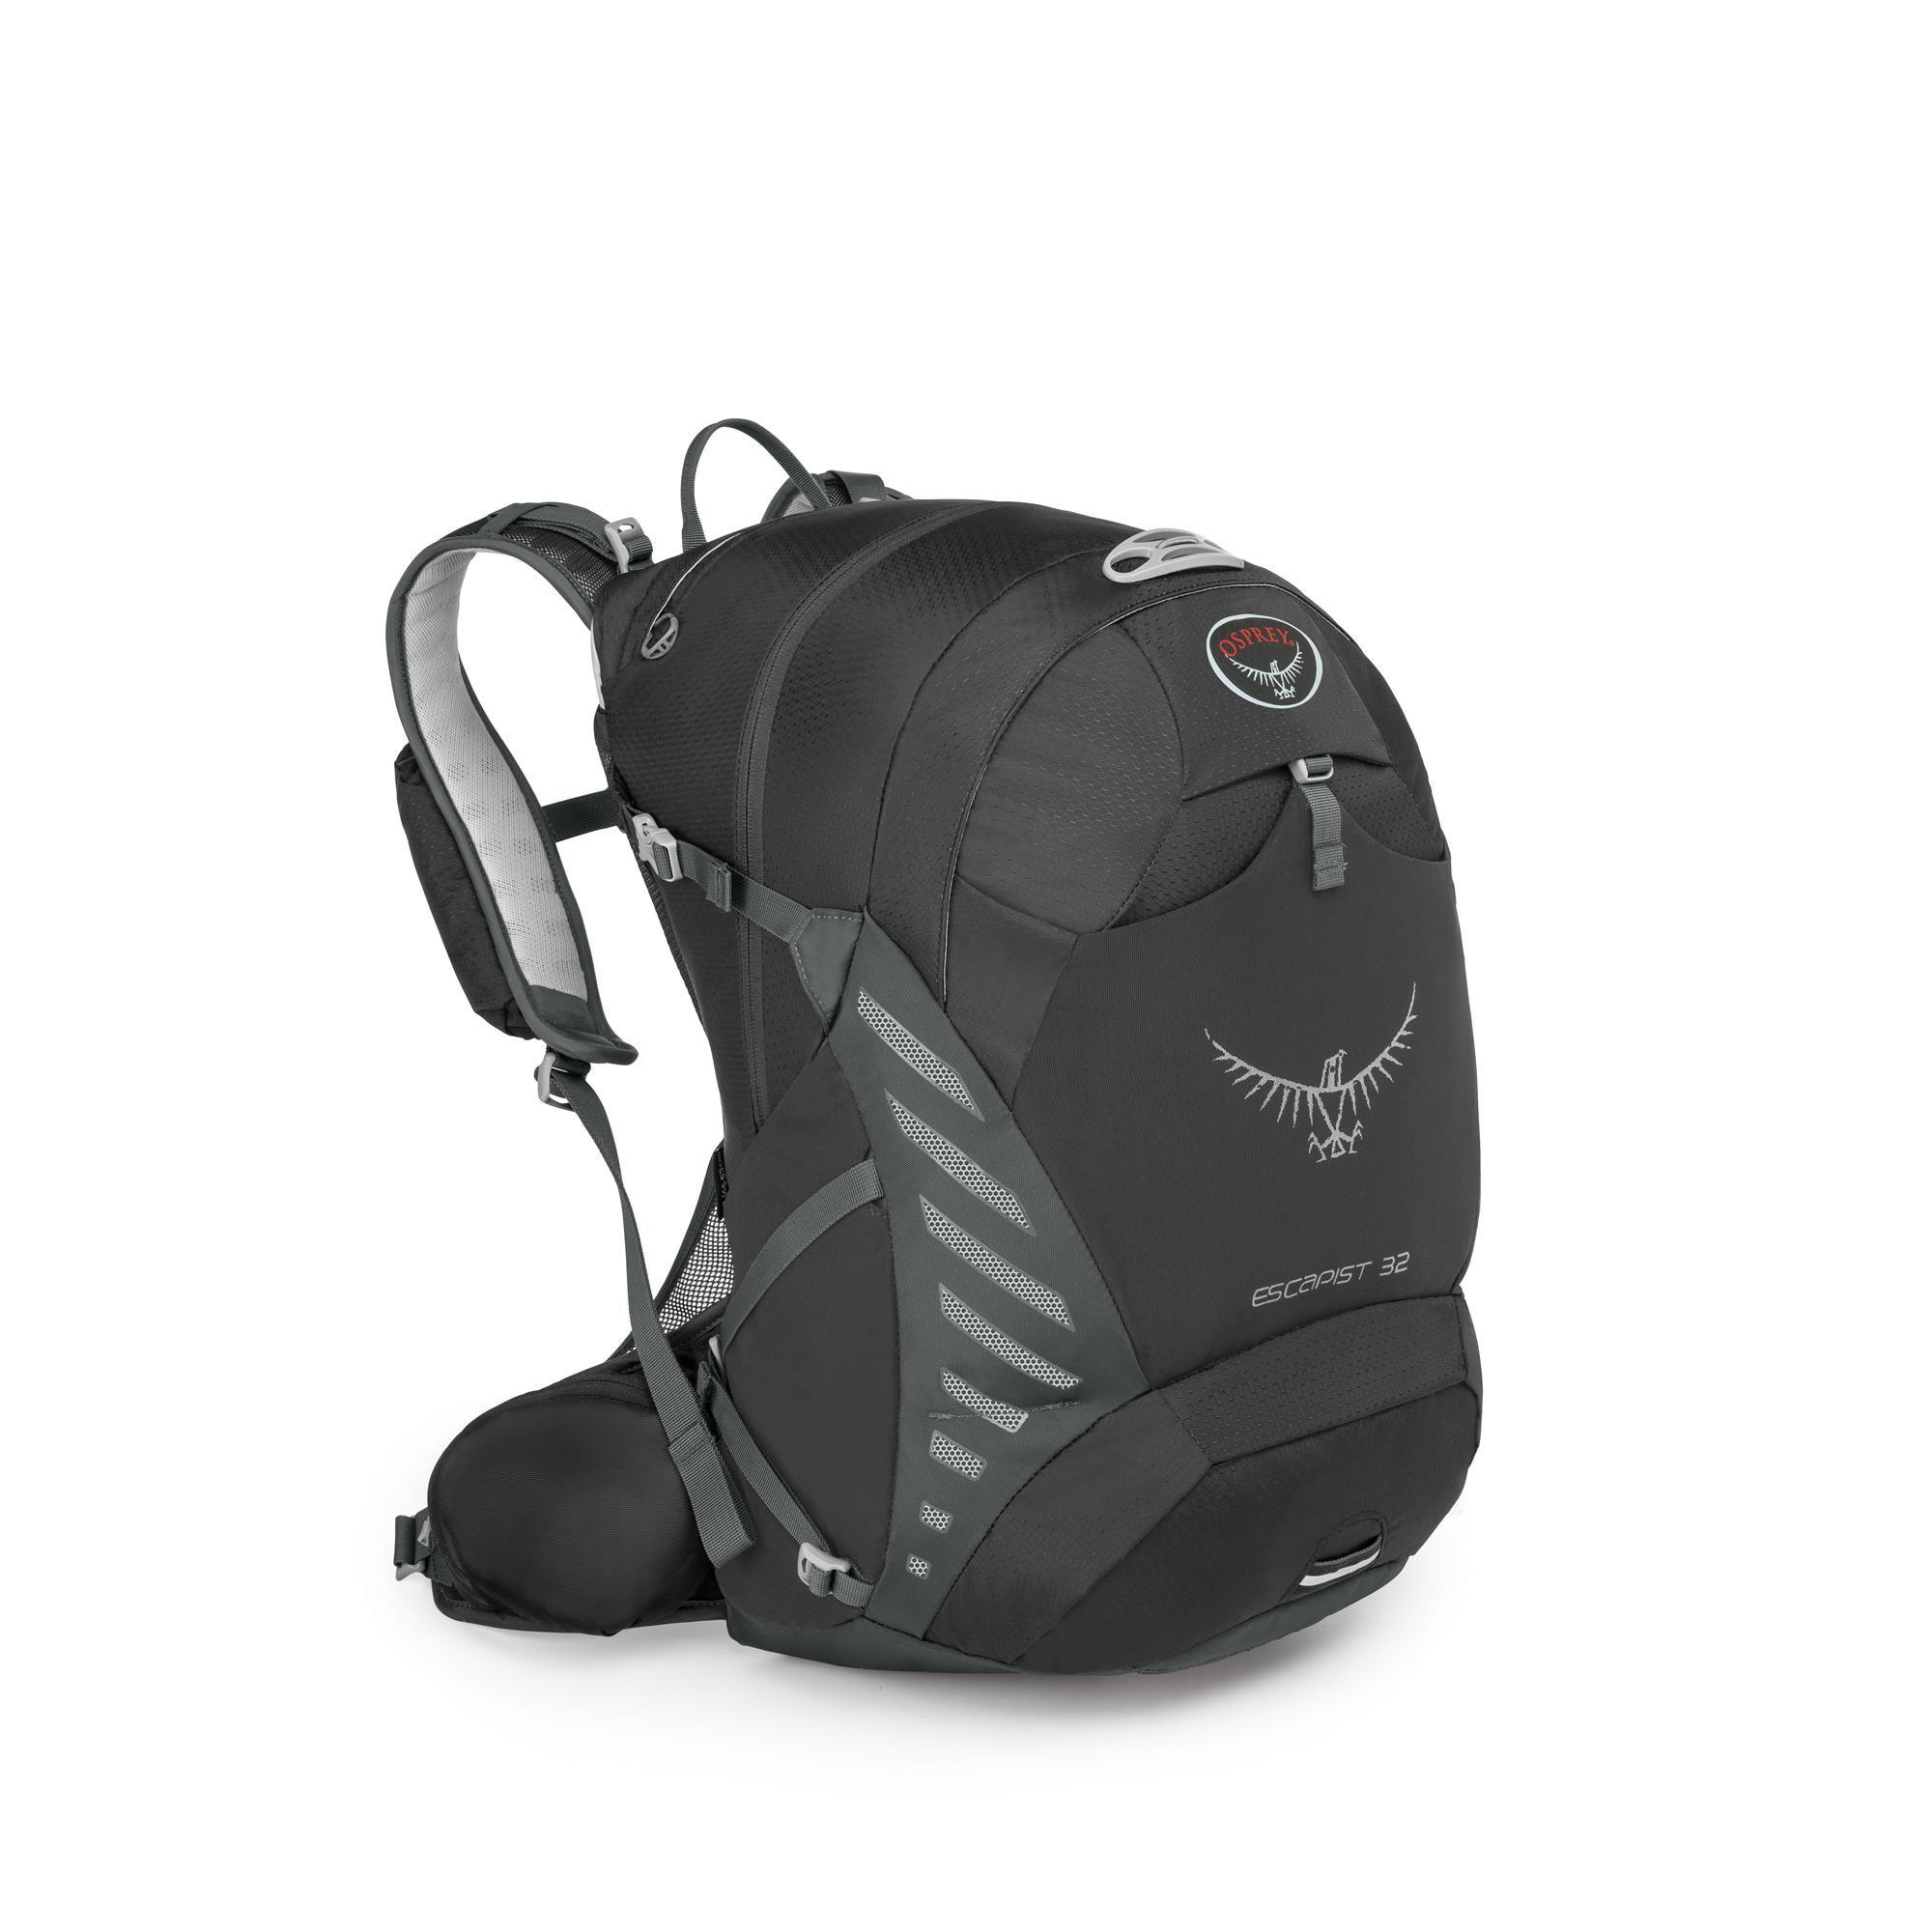 Рюкзак osprey escapist 32 al11769 рюкзак albion football club